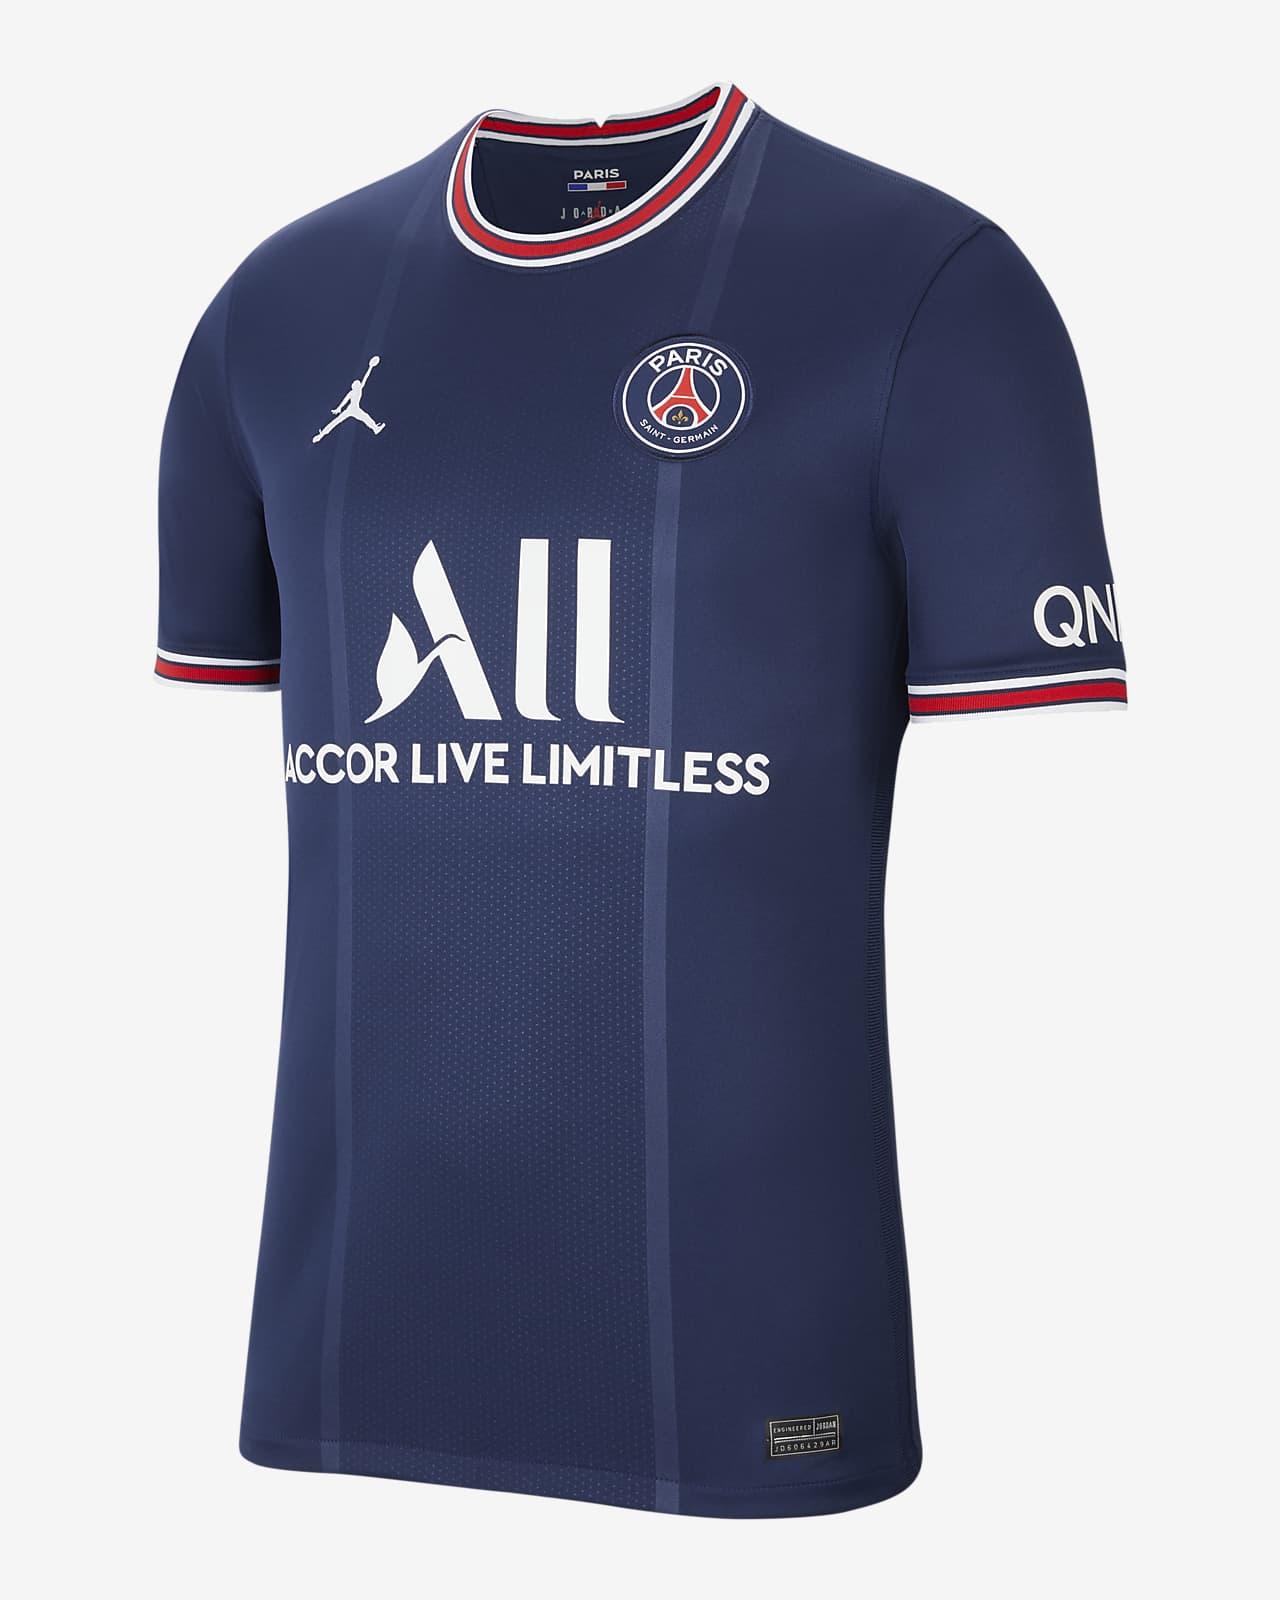 Pánský domácí fotbalový dres Paris Saint-Germain FC 2021/22 Stadium